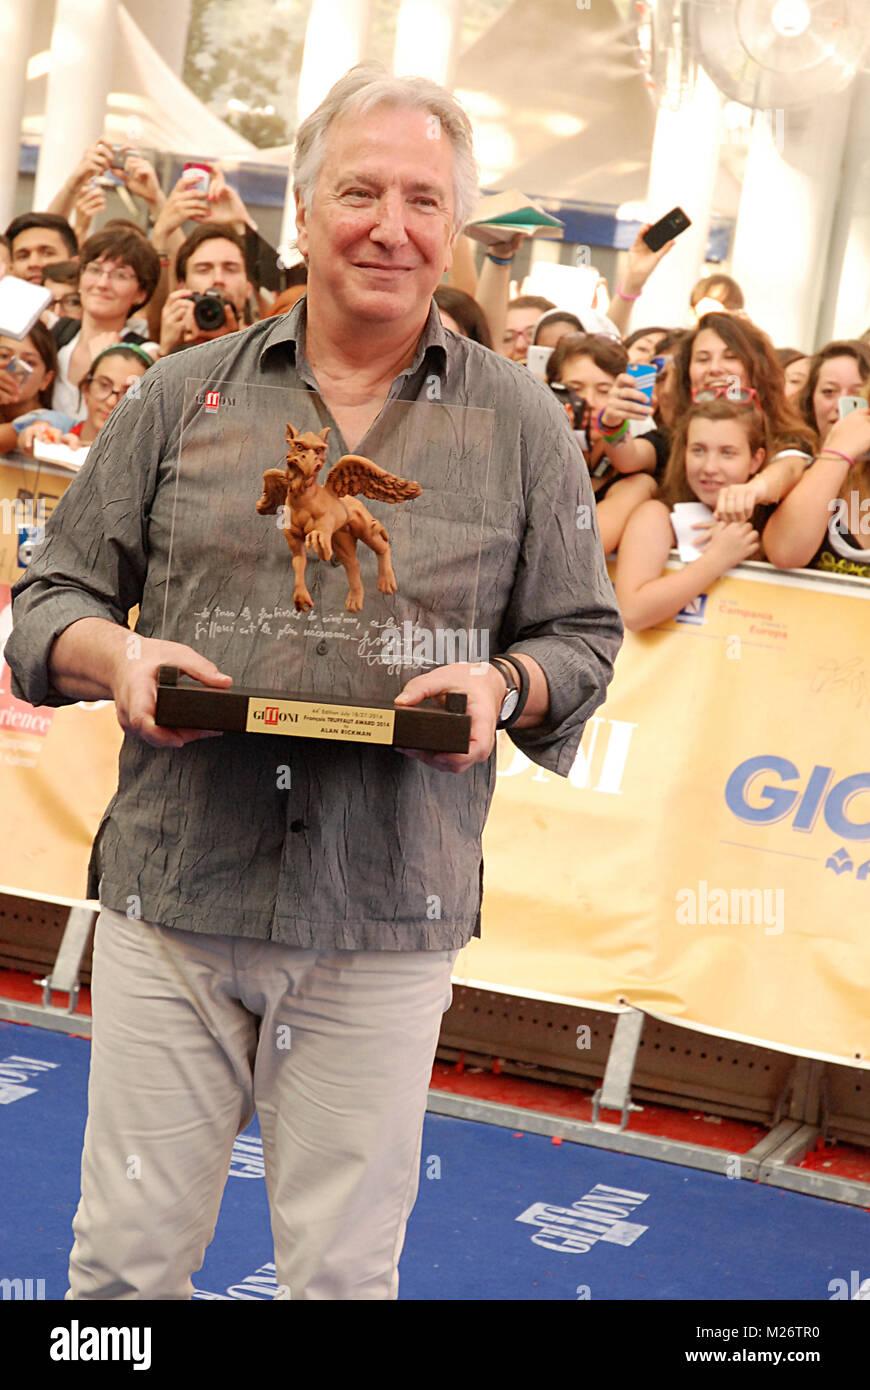 Giffoni Valle Piana, Sa, Italy - July 23, 2014 : Alan Rickman at Giffoni Film Festival 2014 - on July 23, 2014 in - Stock Image